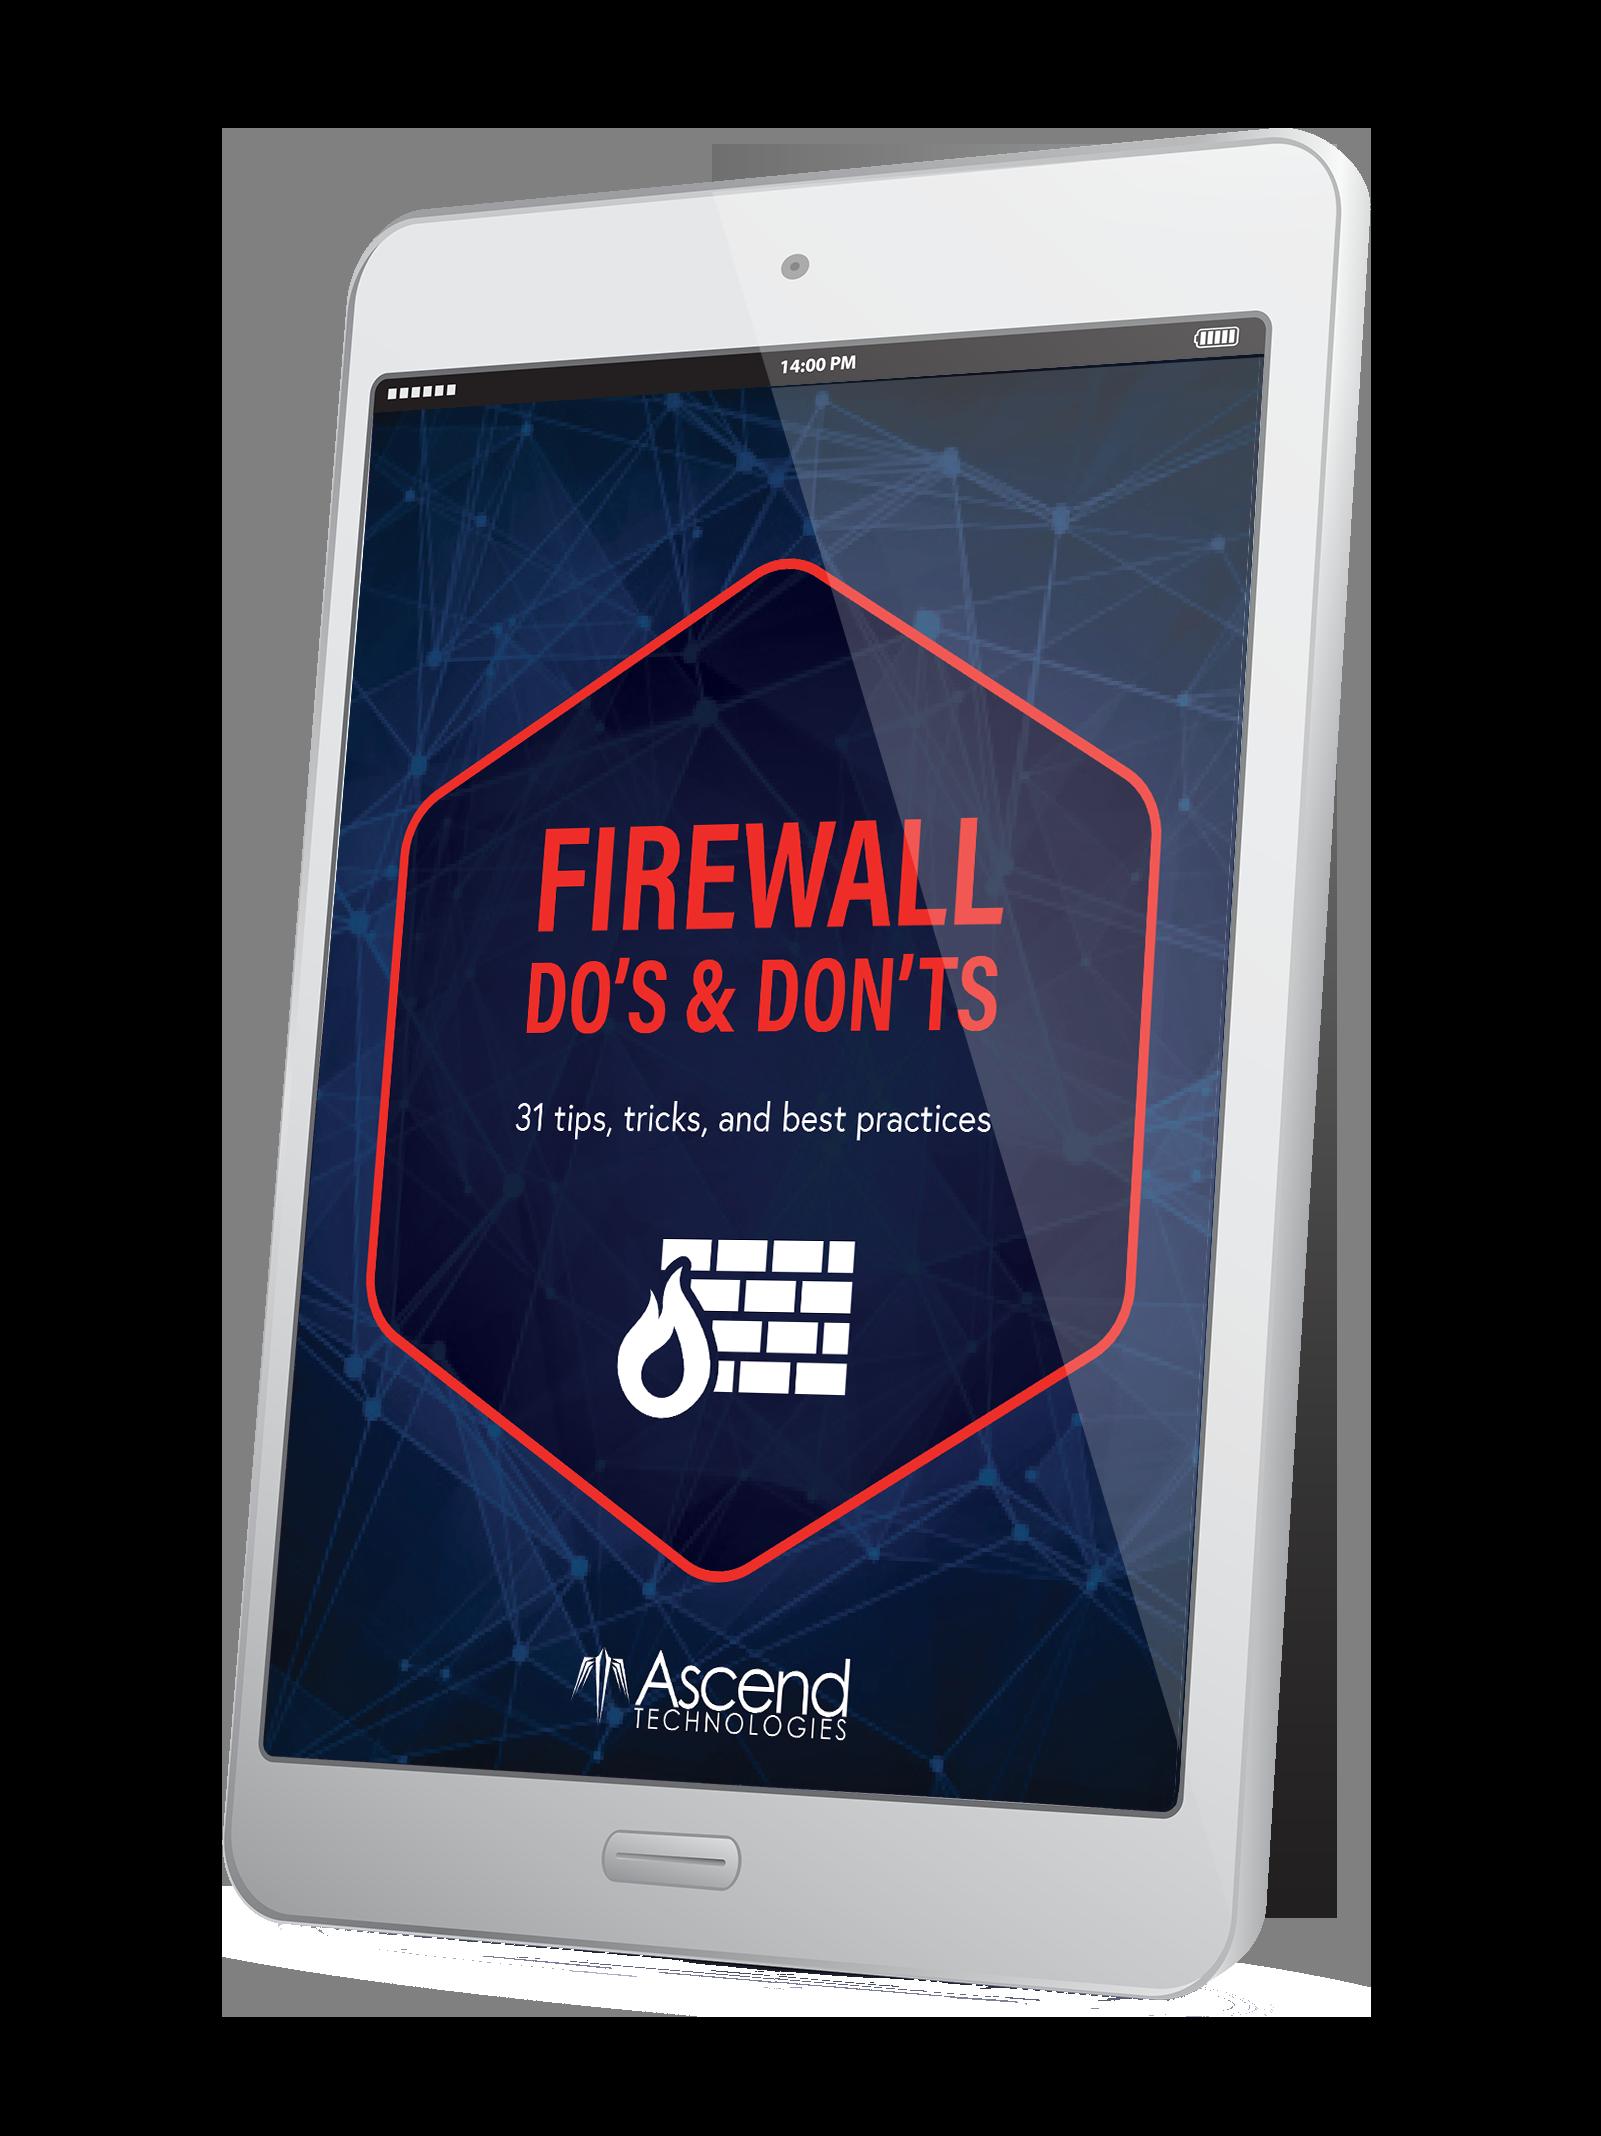 Firewall Do's & Don'ts